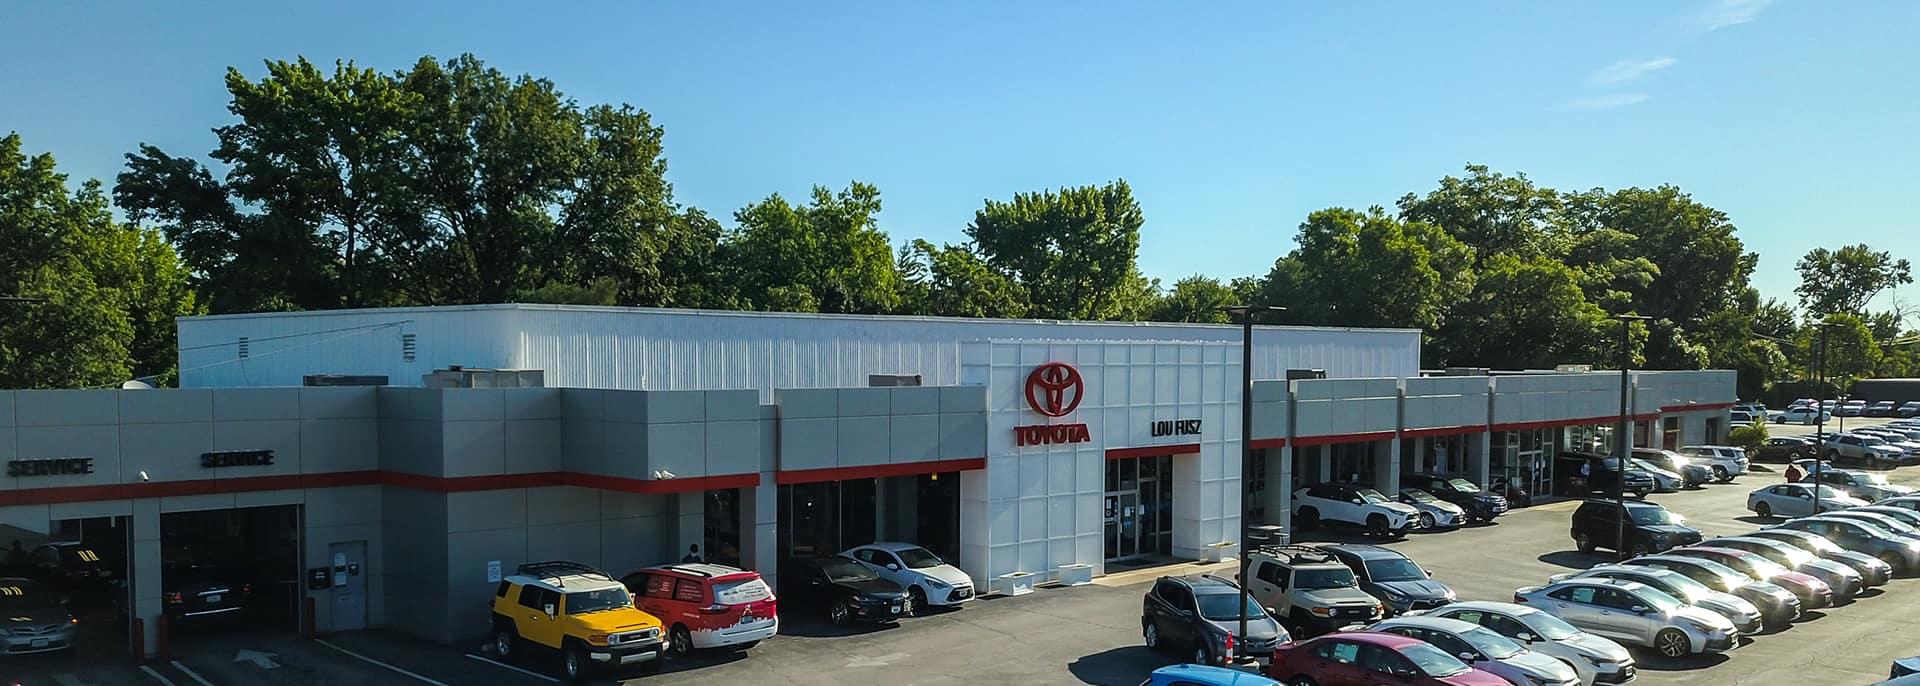 Toyota Service Center St. Louis